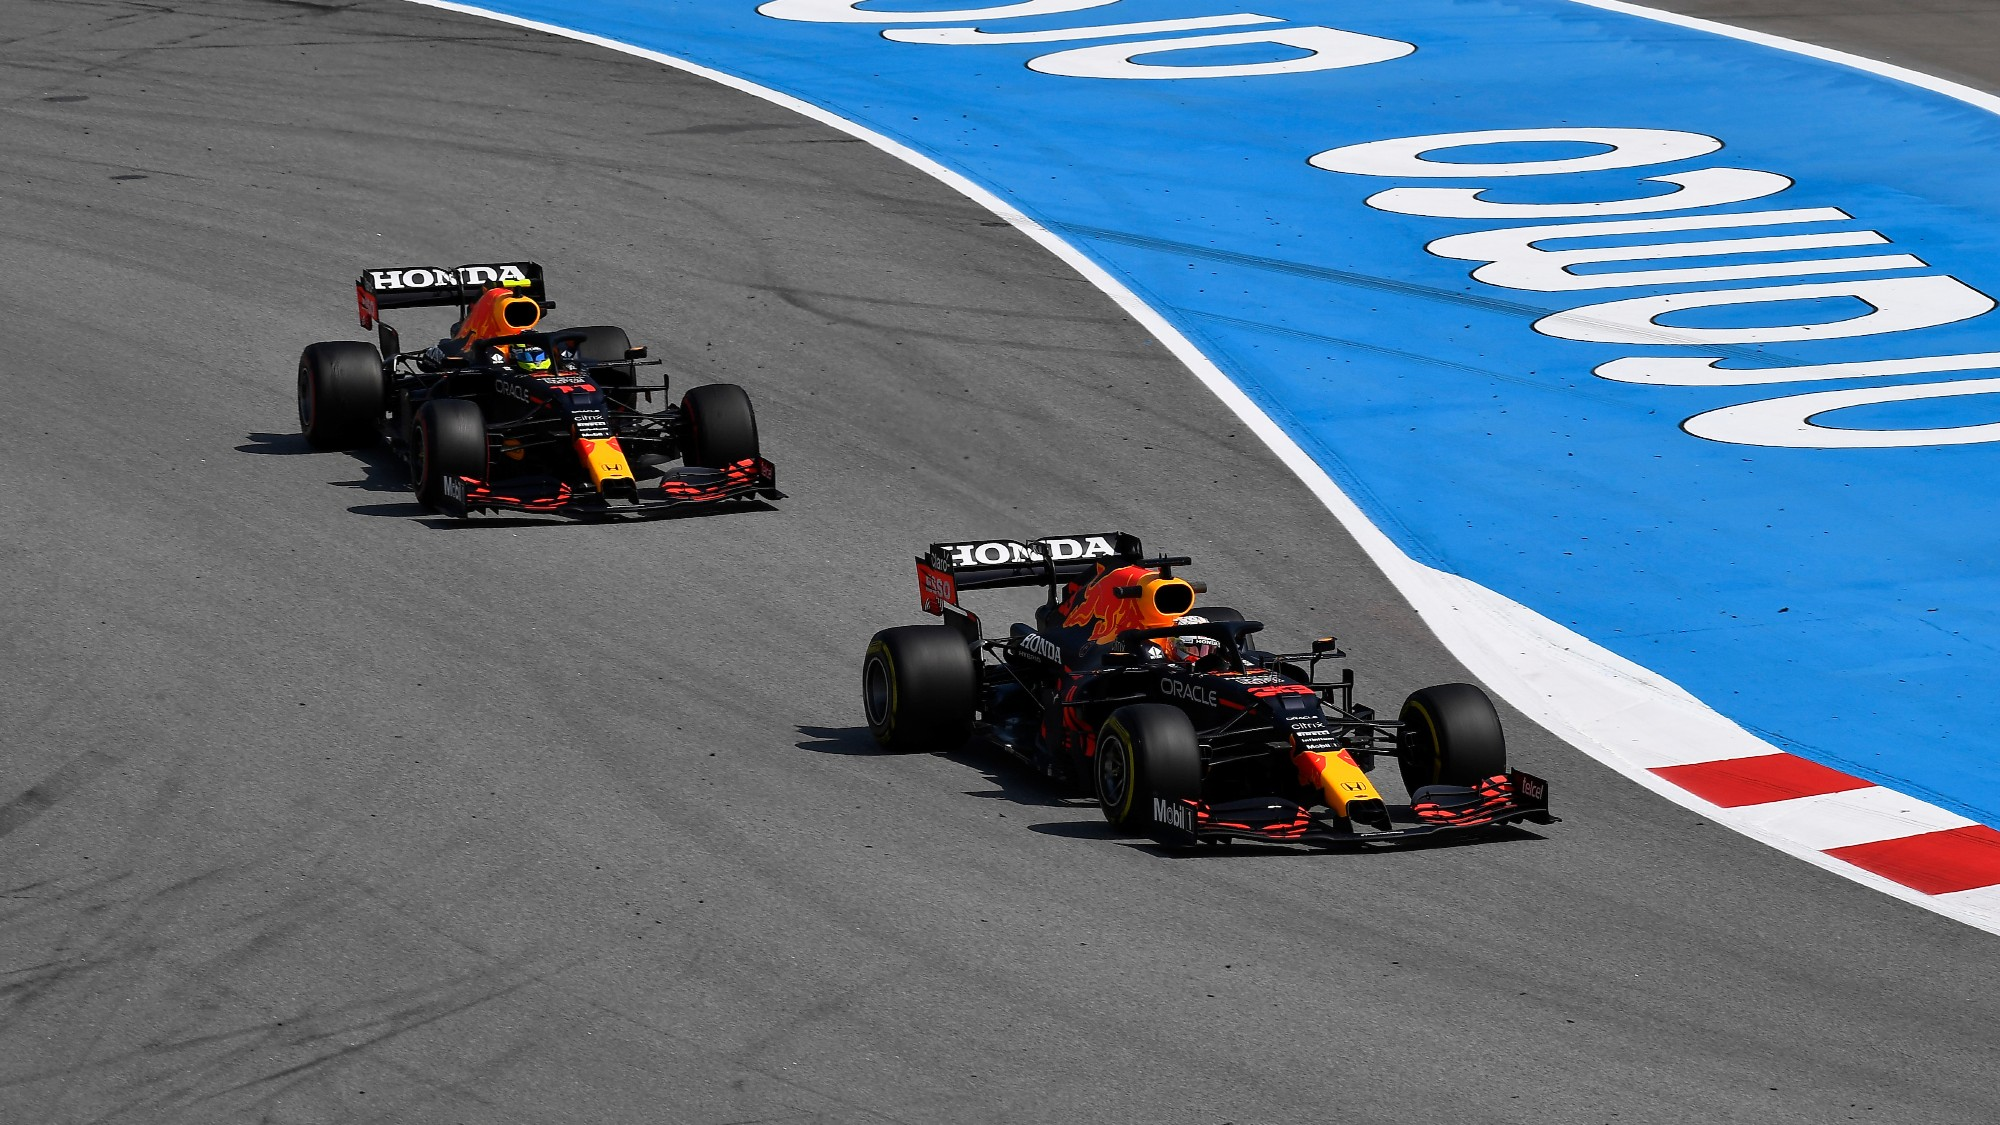 2021 Sergio Perez, Spanish GP